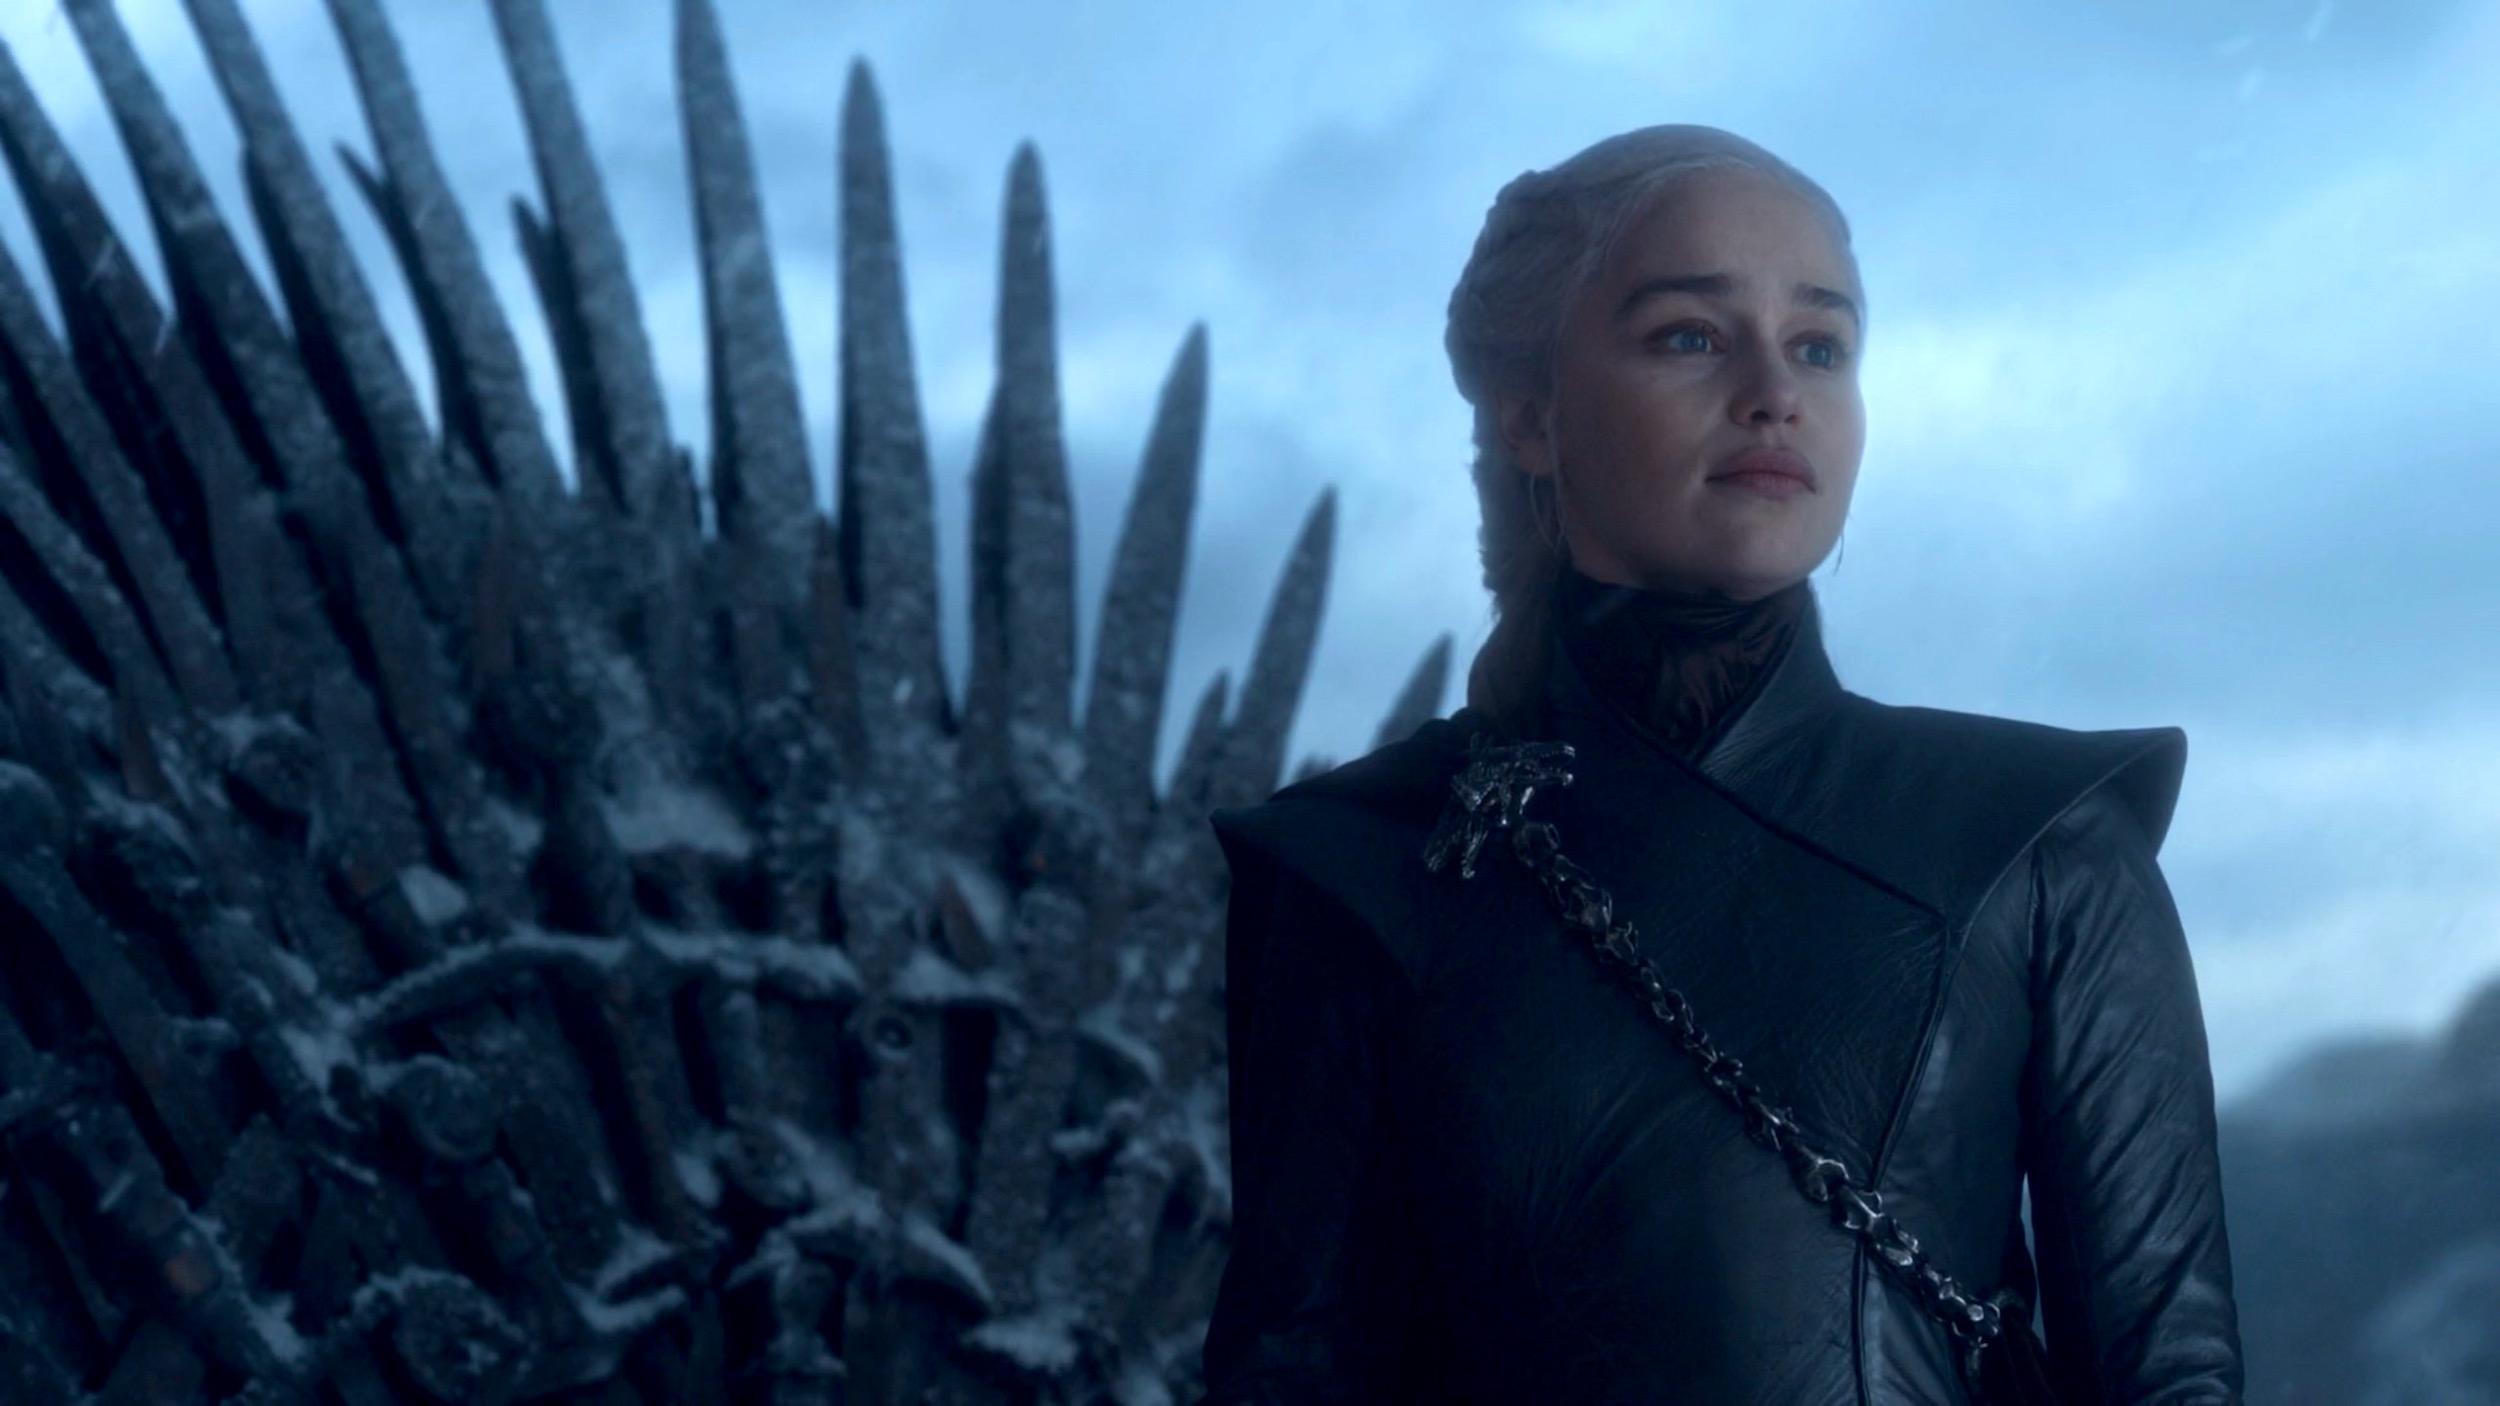 Daenerys Targaryen in GoT 8x06 - The Iron Throne